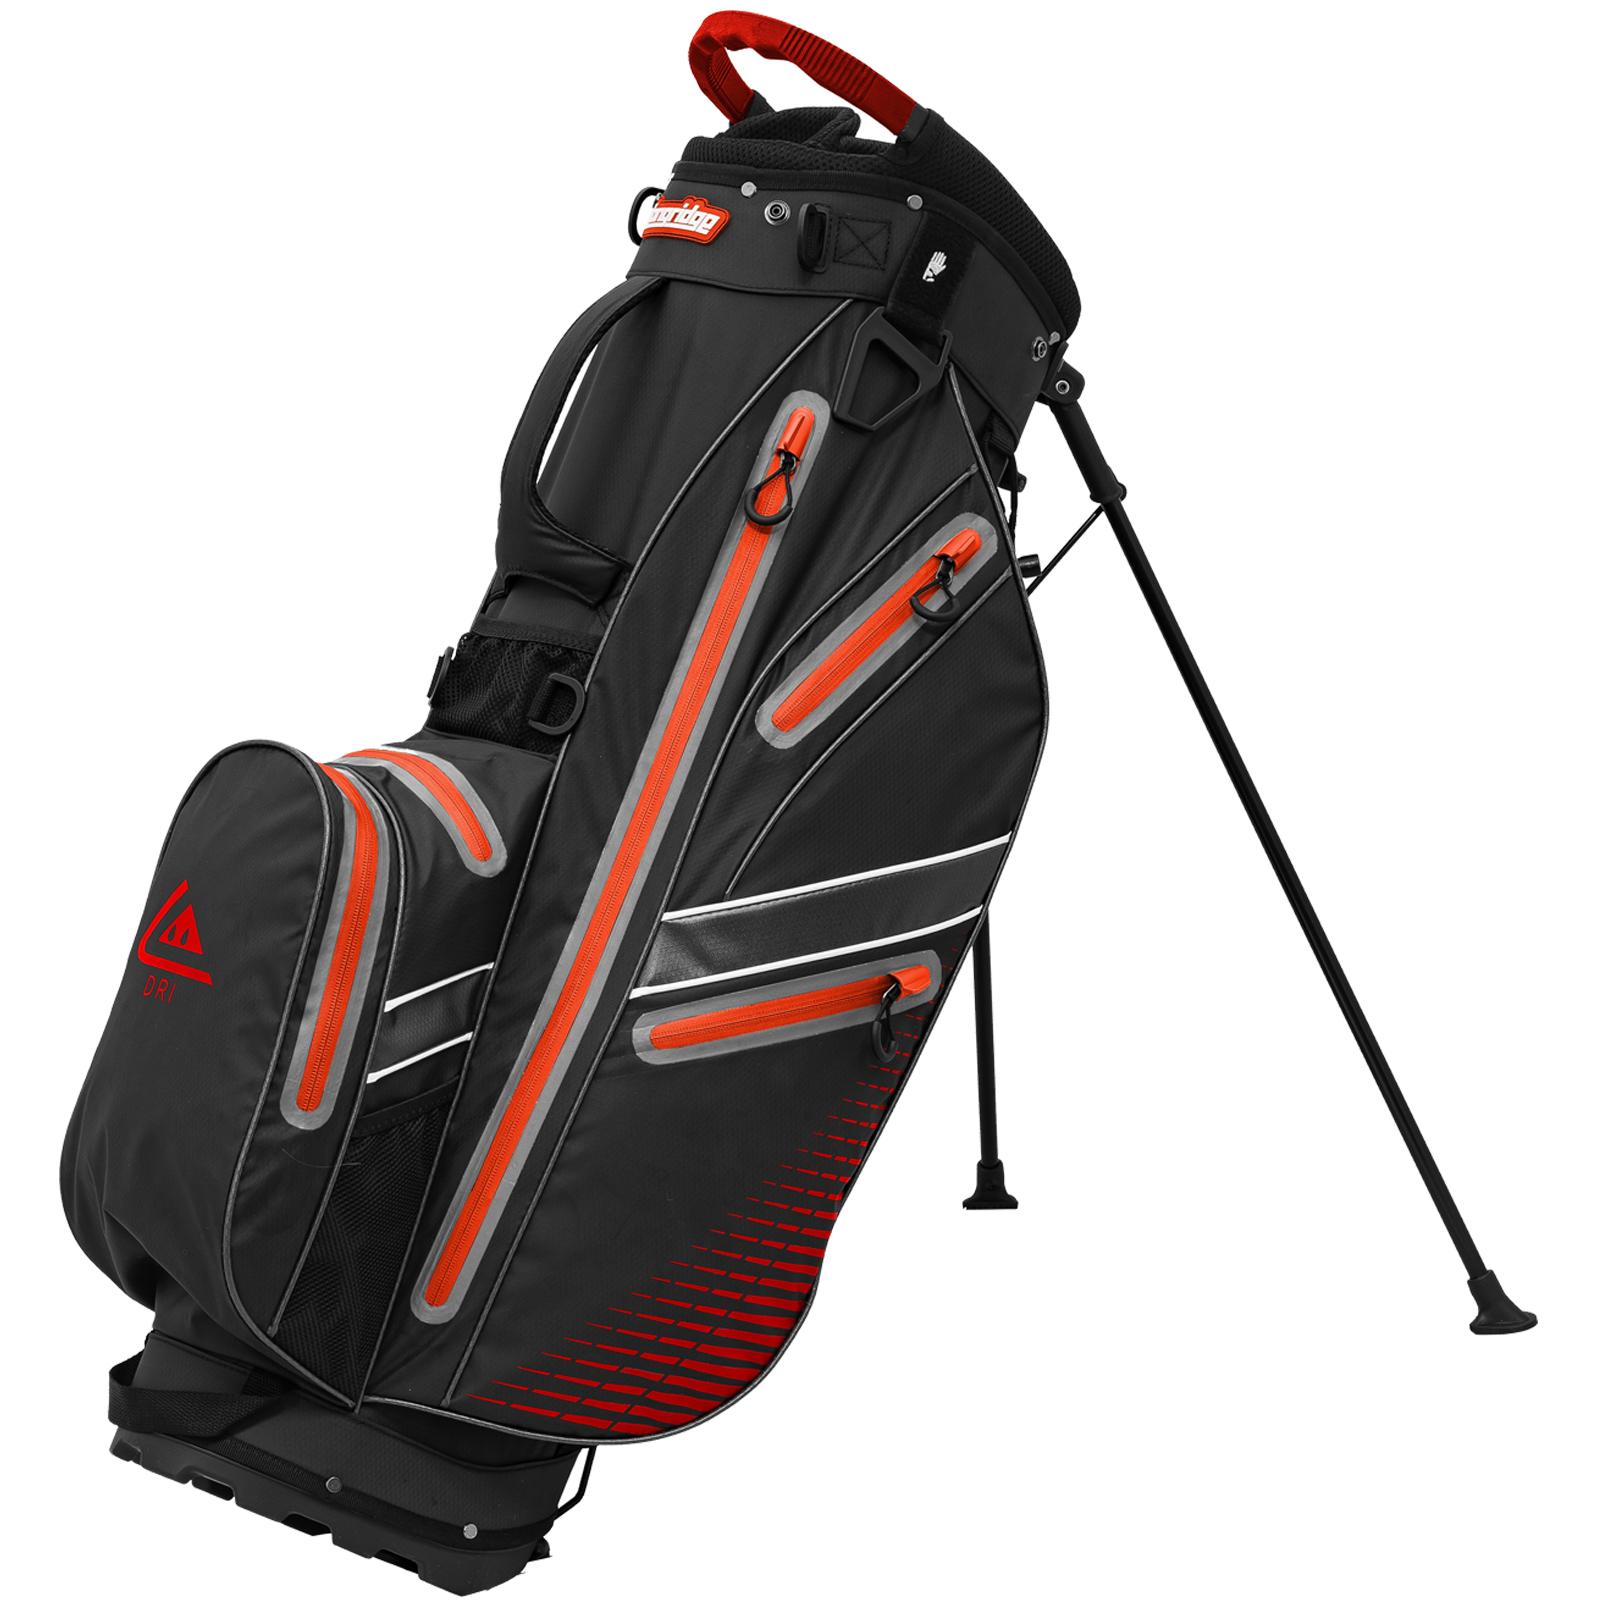 Longridge Aqua 2 Waterproof Golf Stand Bag  - Black